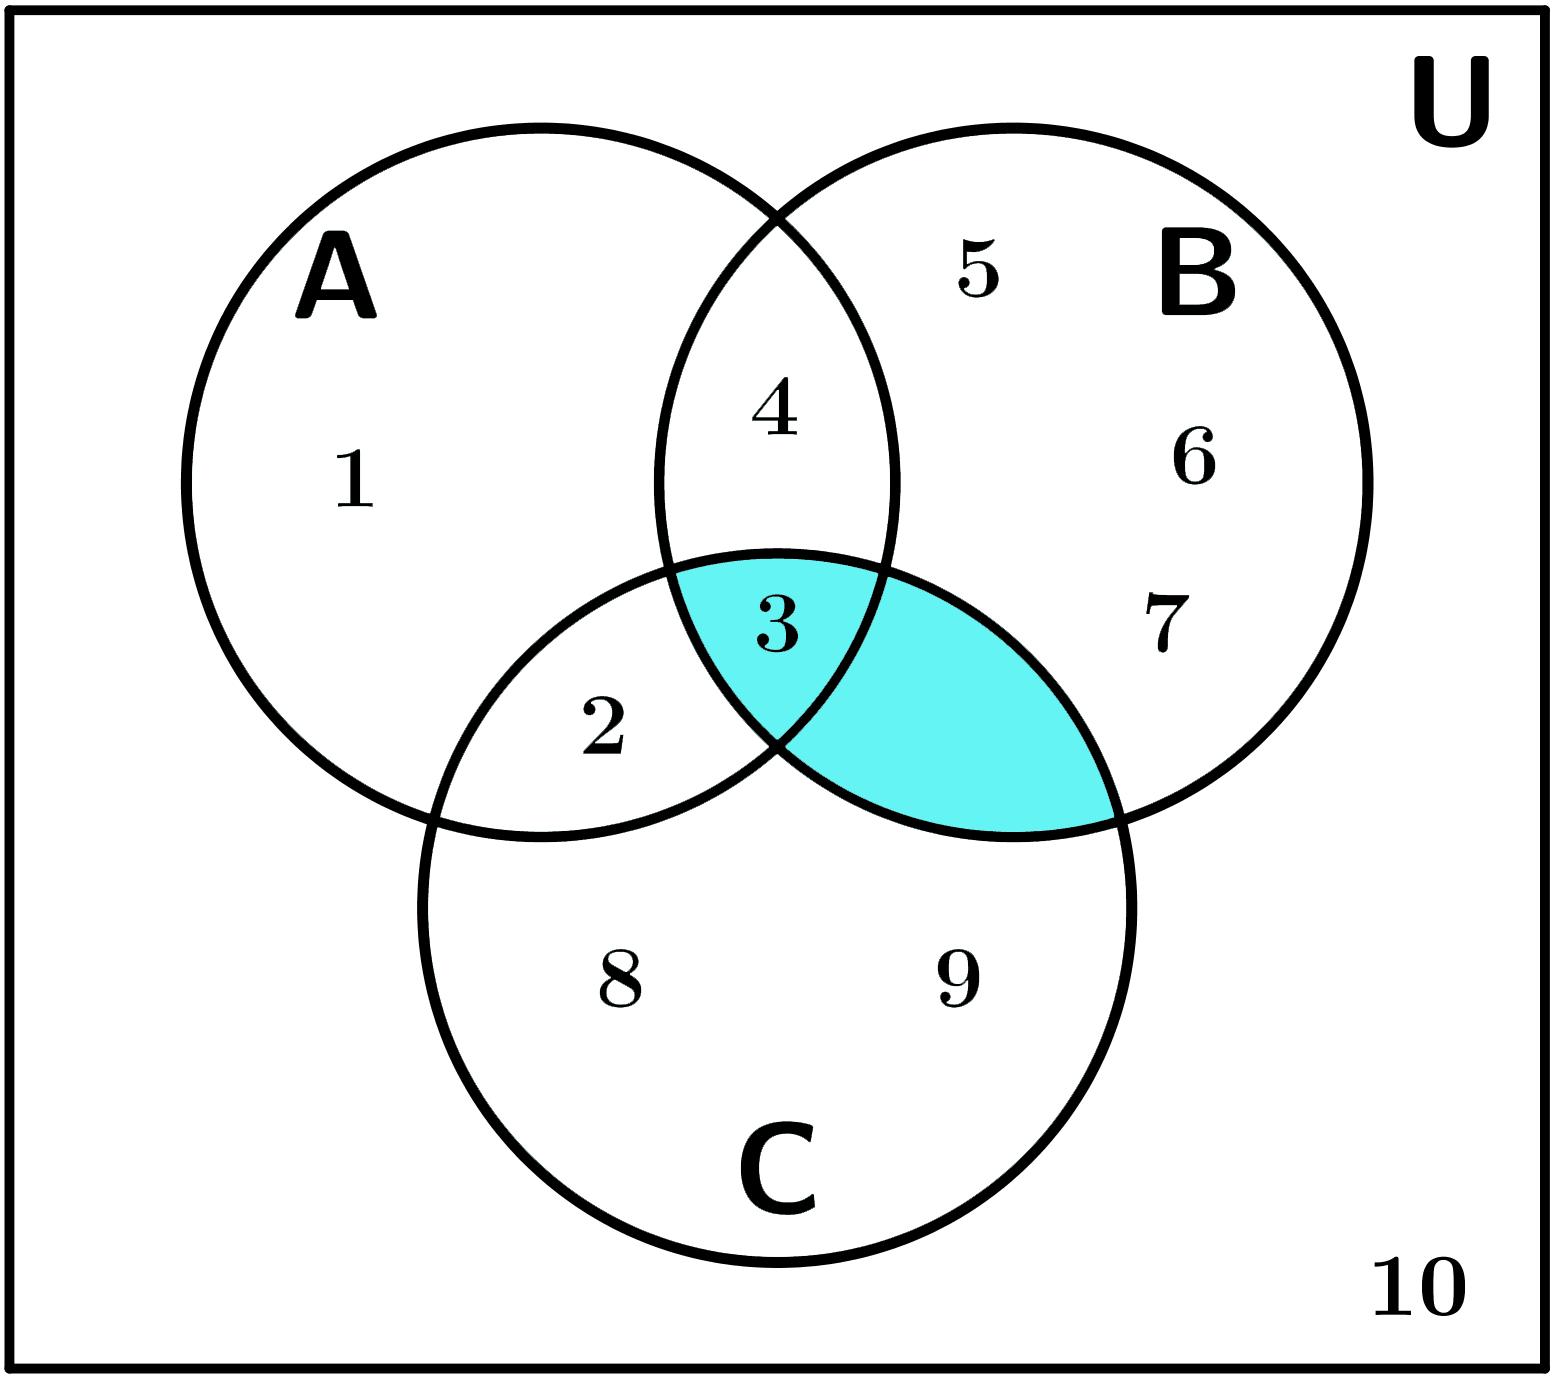 A B Compliment Venn Diagram